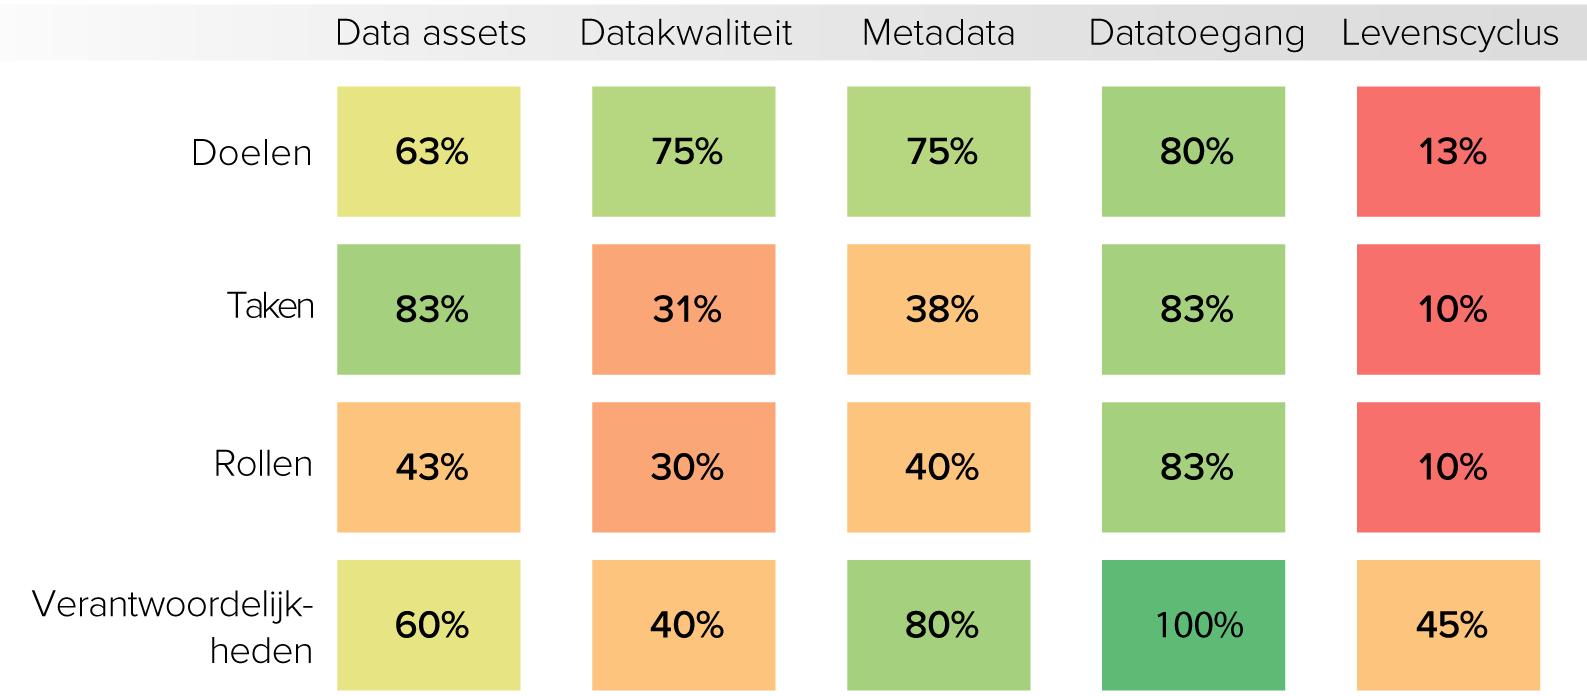 Meldplicht Datalekken Landscape Increasing Data Impact